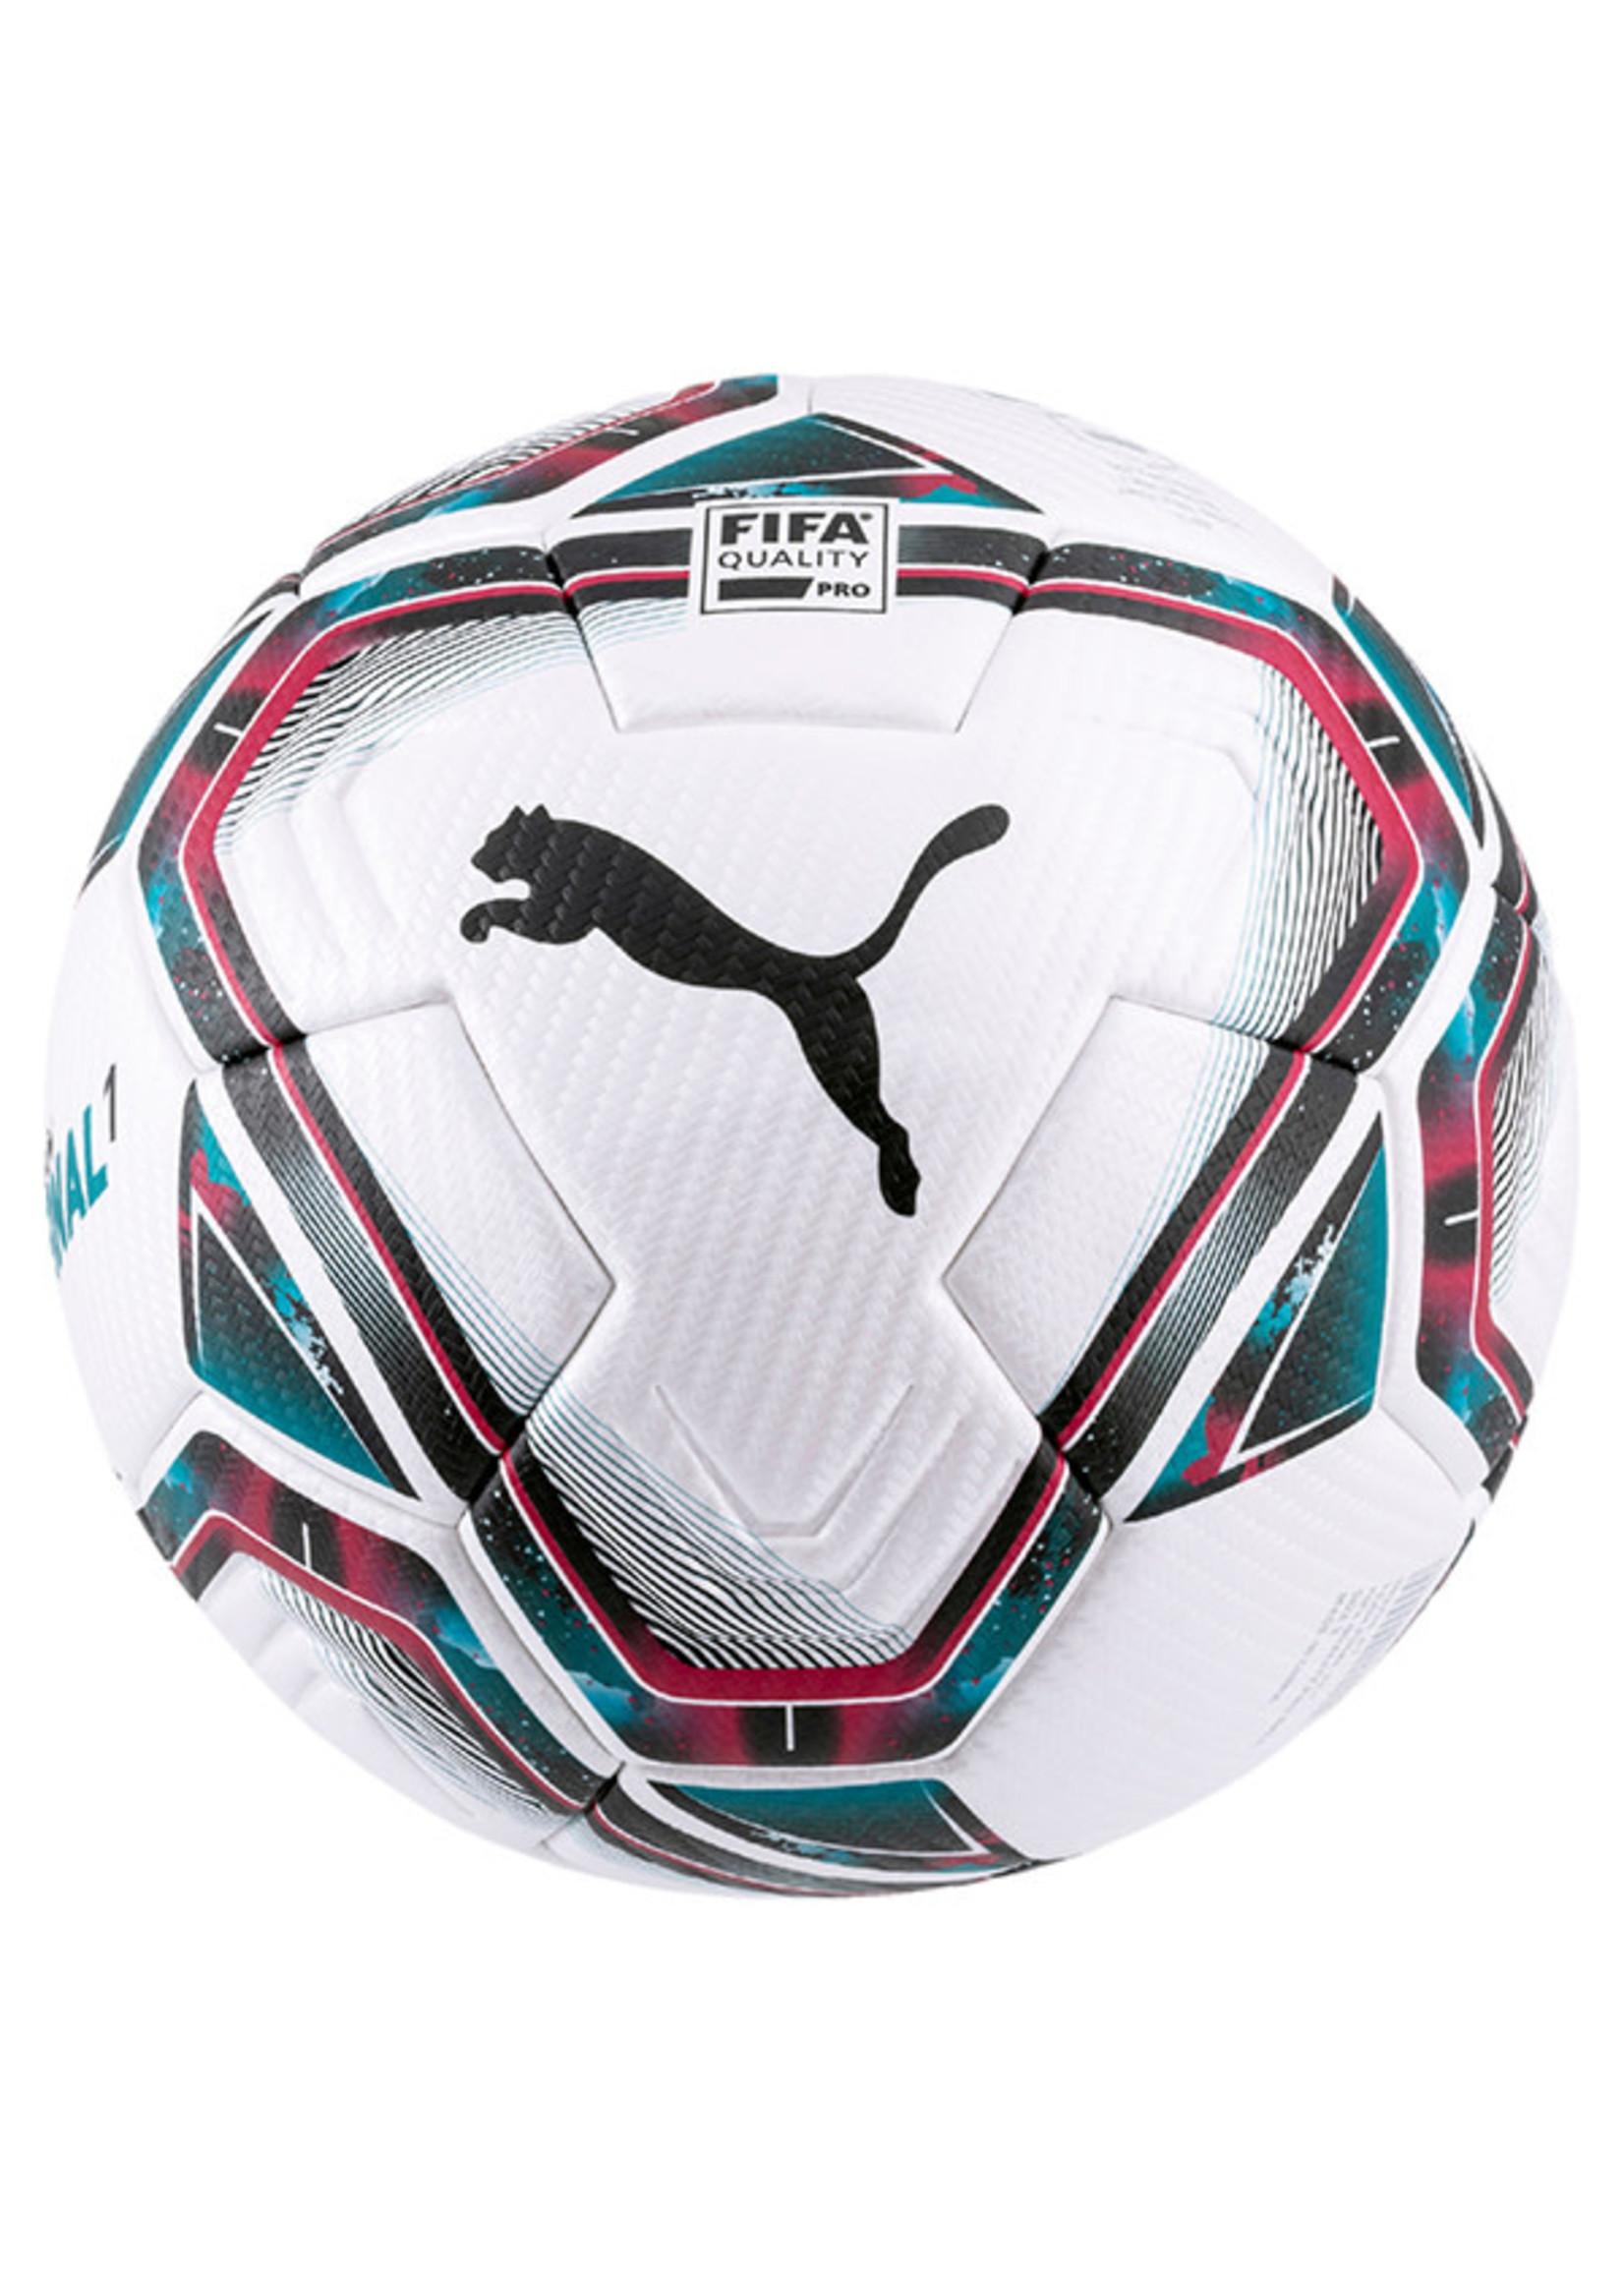 Puma Team Final 21.1 Summer Fifa Quality Pro Ball